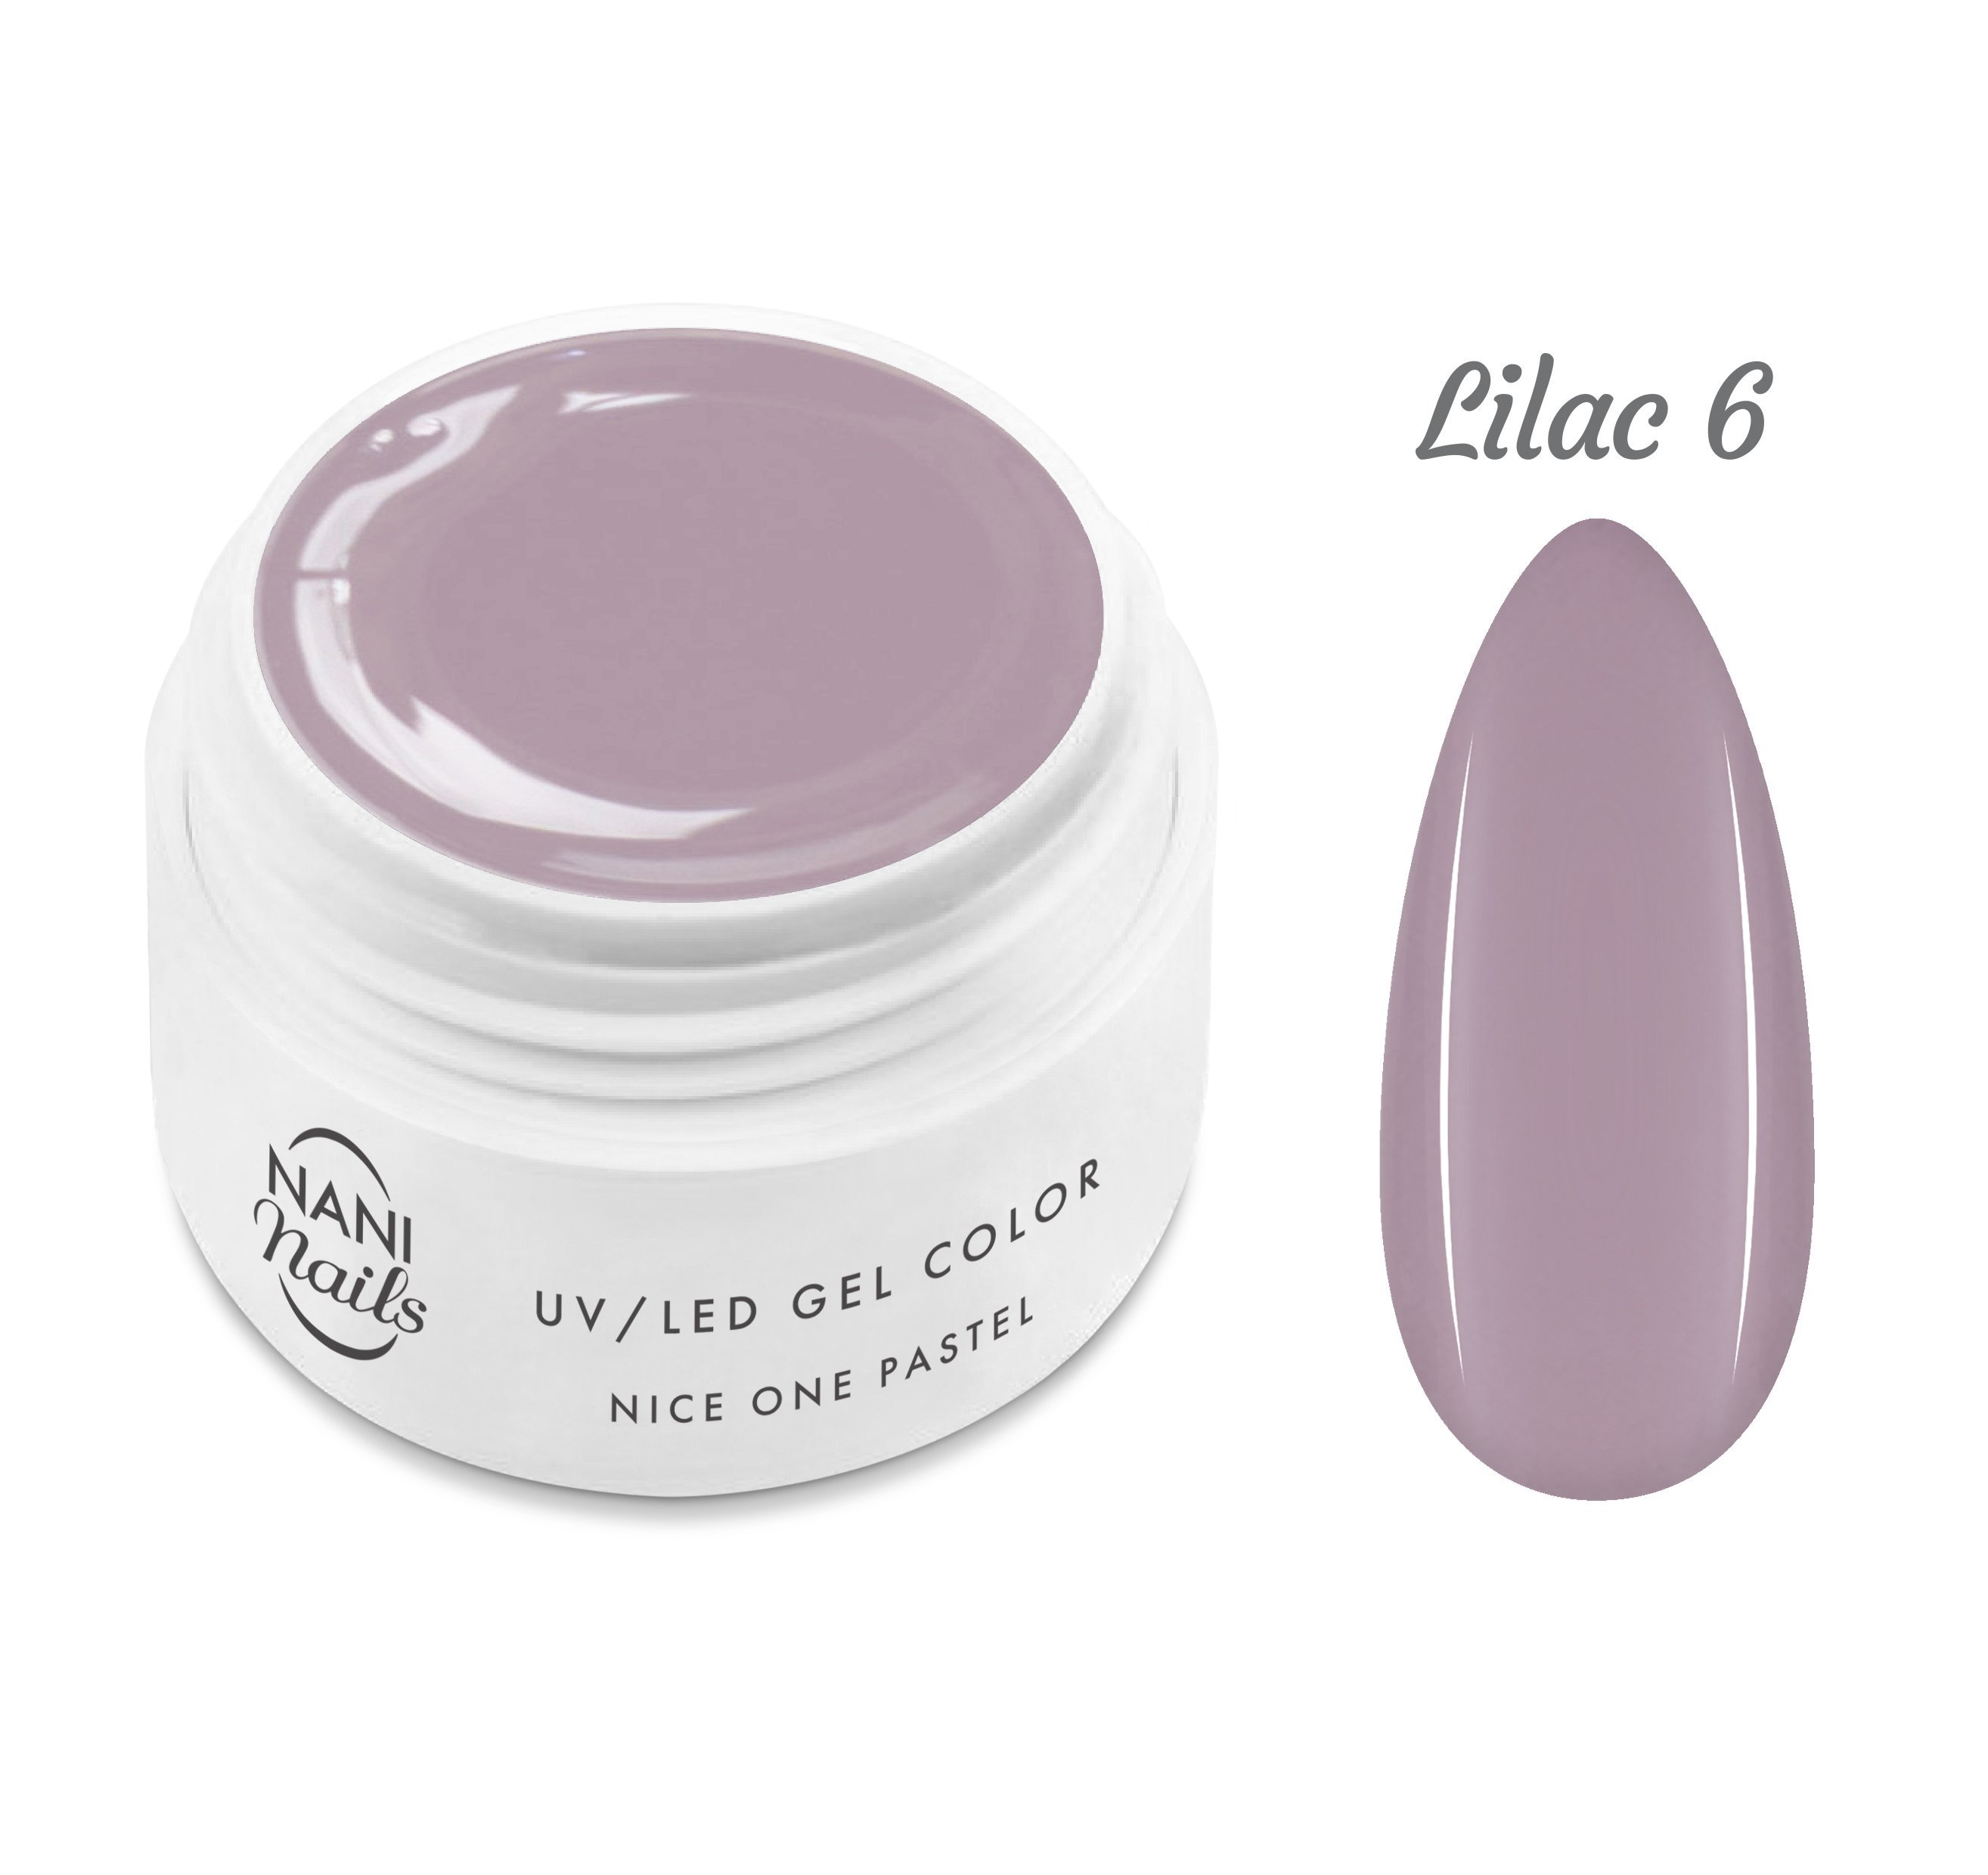 NANI UV gél Nice One Pastel 5 ml - Lilac